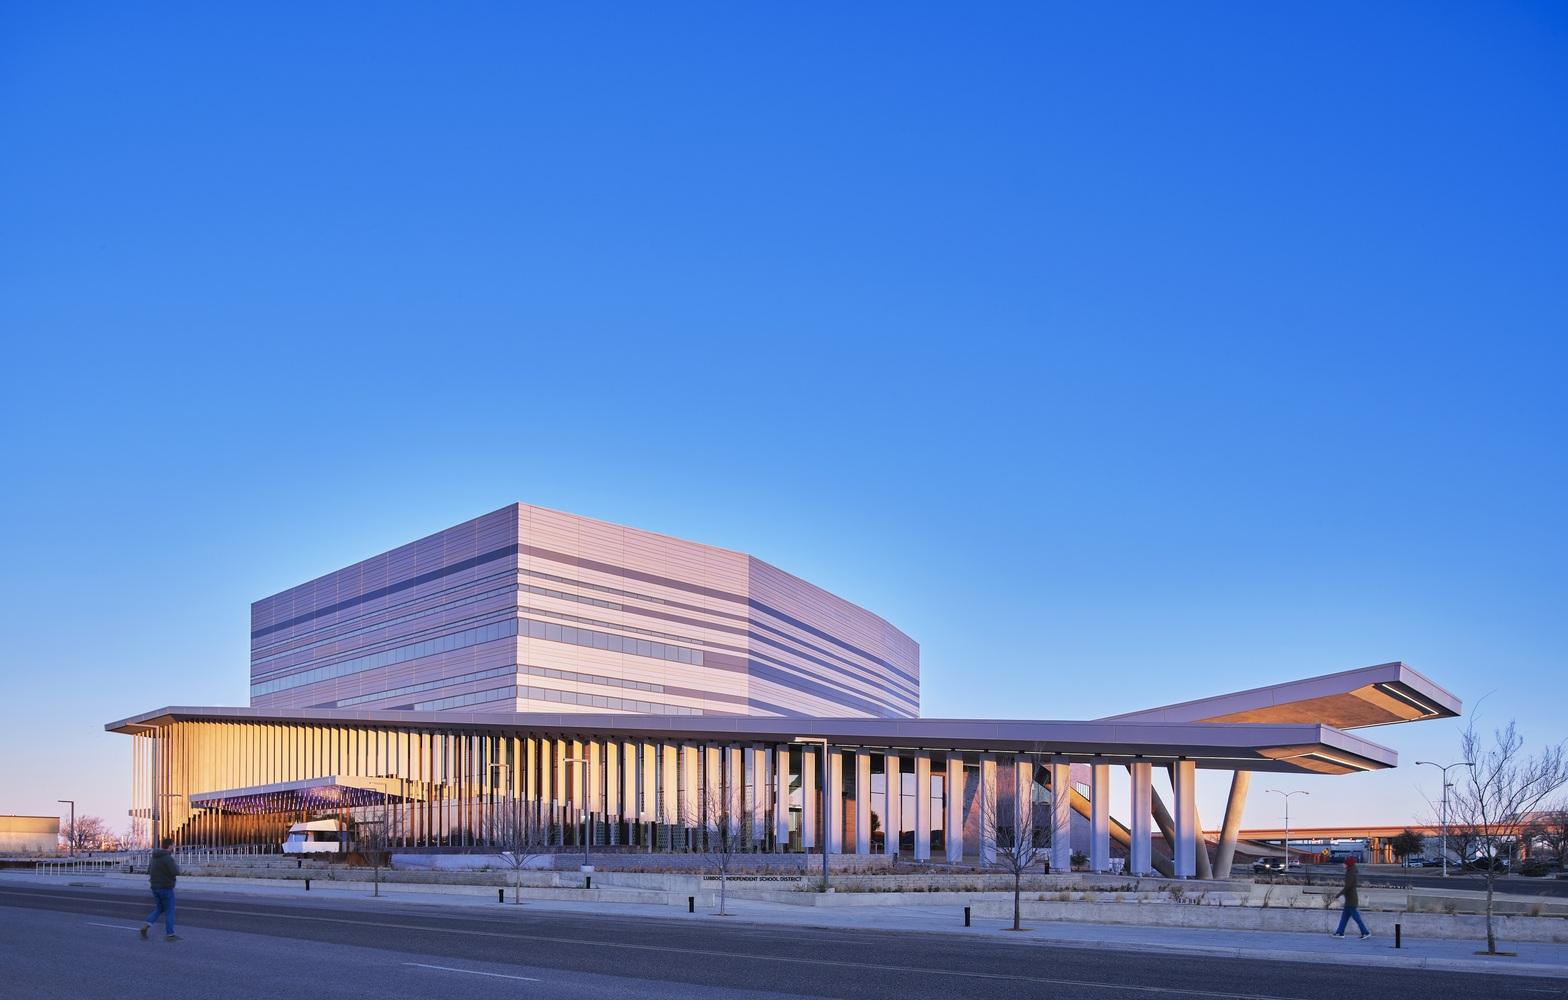 Buddy Holly 表演艺术与科学大厅,成为将城市充满活力的表演艺术社区